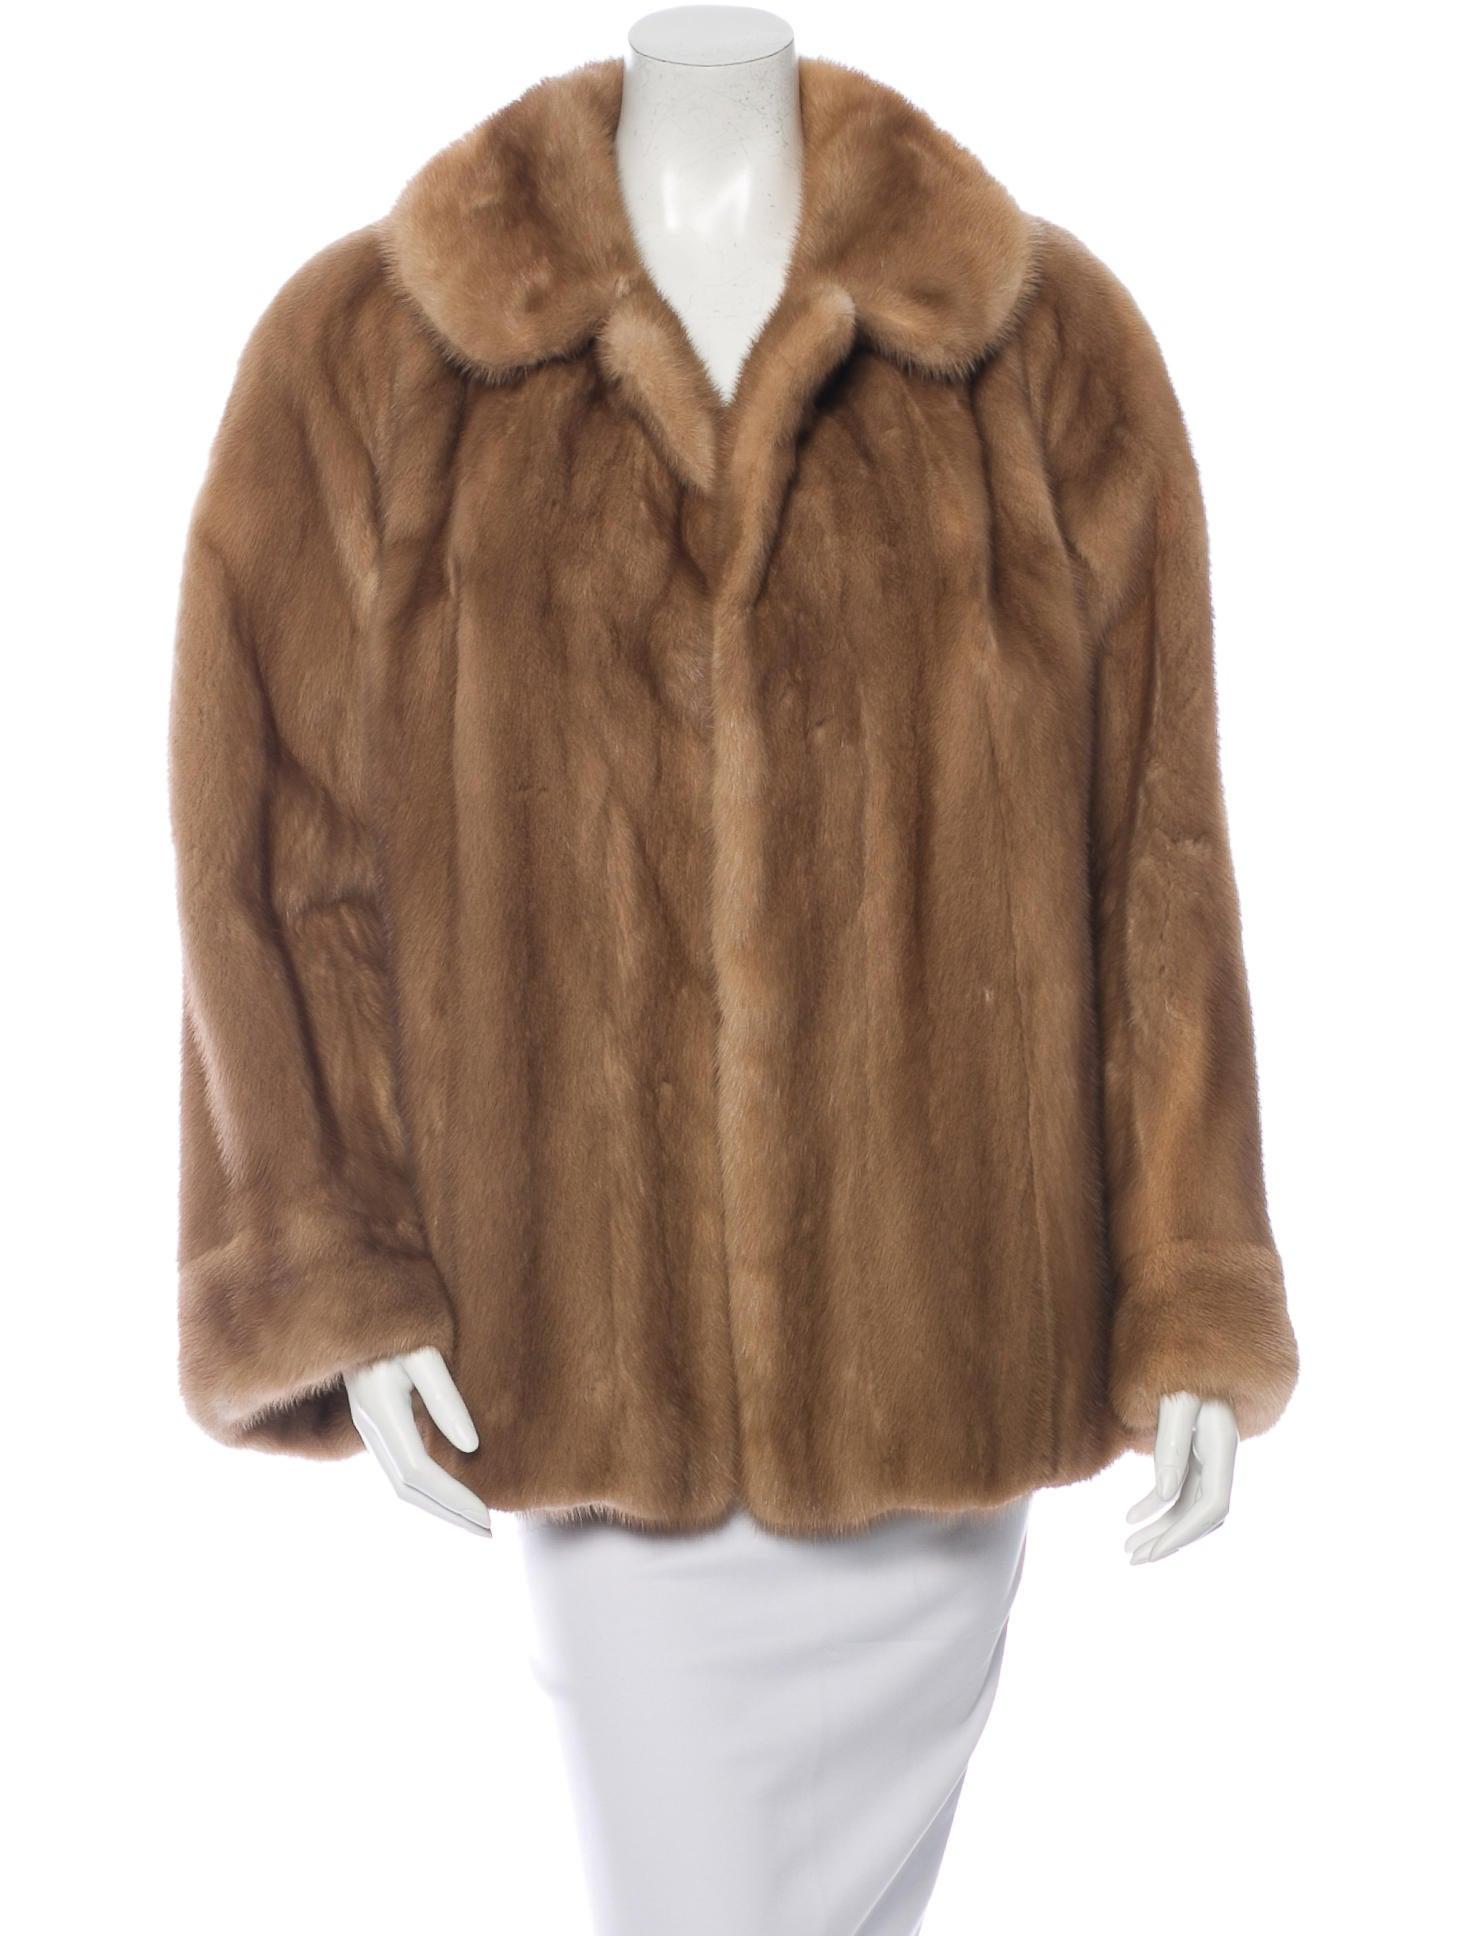 Mink Coat Value >> Fur Mink Fur Open Front Coat - Clothing - FUR20998 | The ...